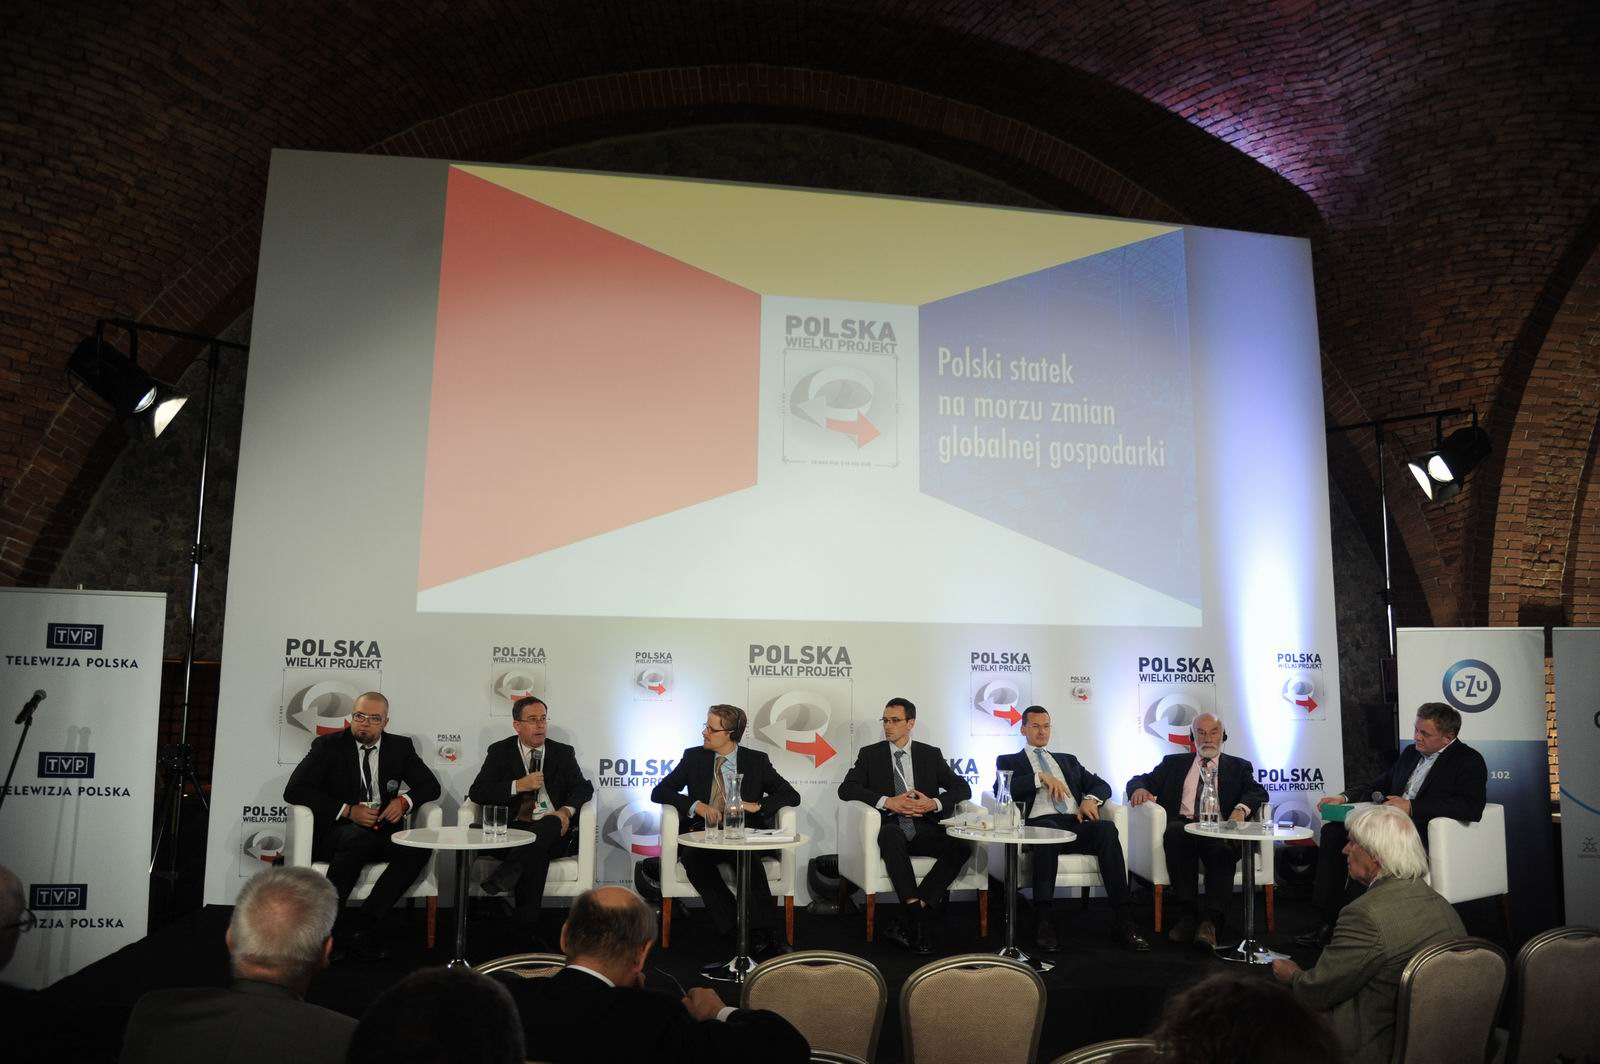 Polski statek na morzu zmian globalnej gospodarki